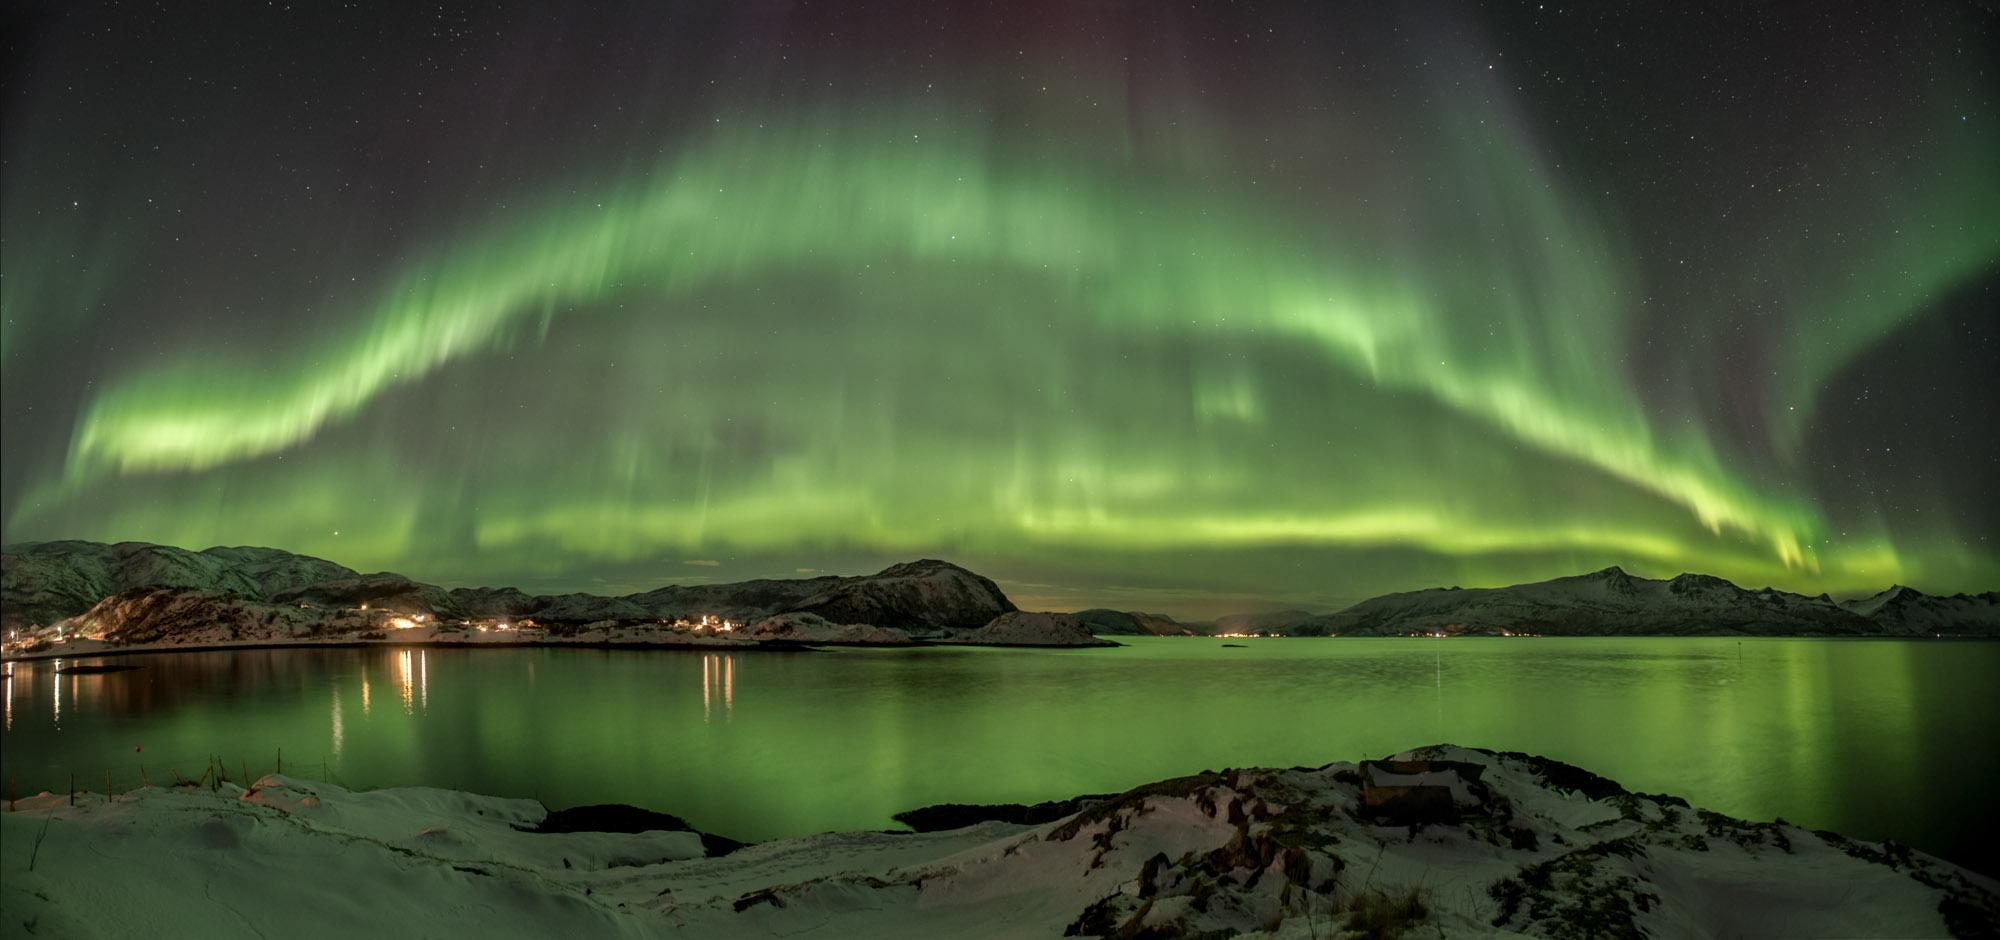 Aurora Borealis over Norway 2017